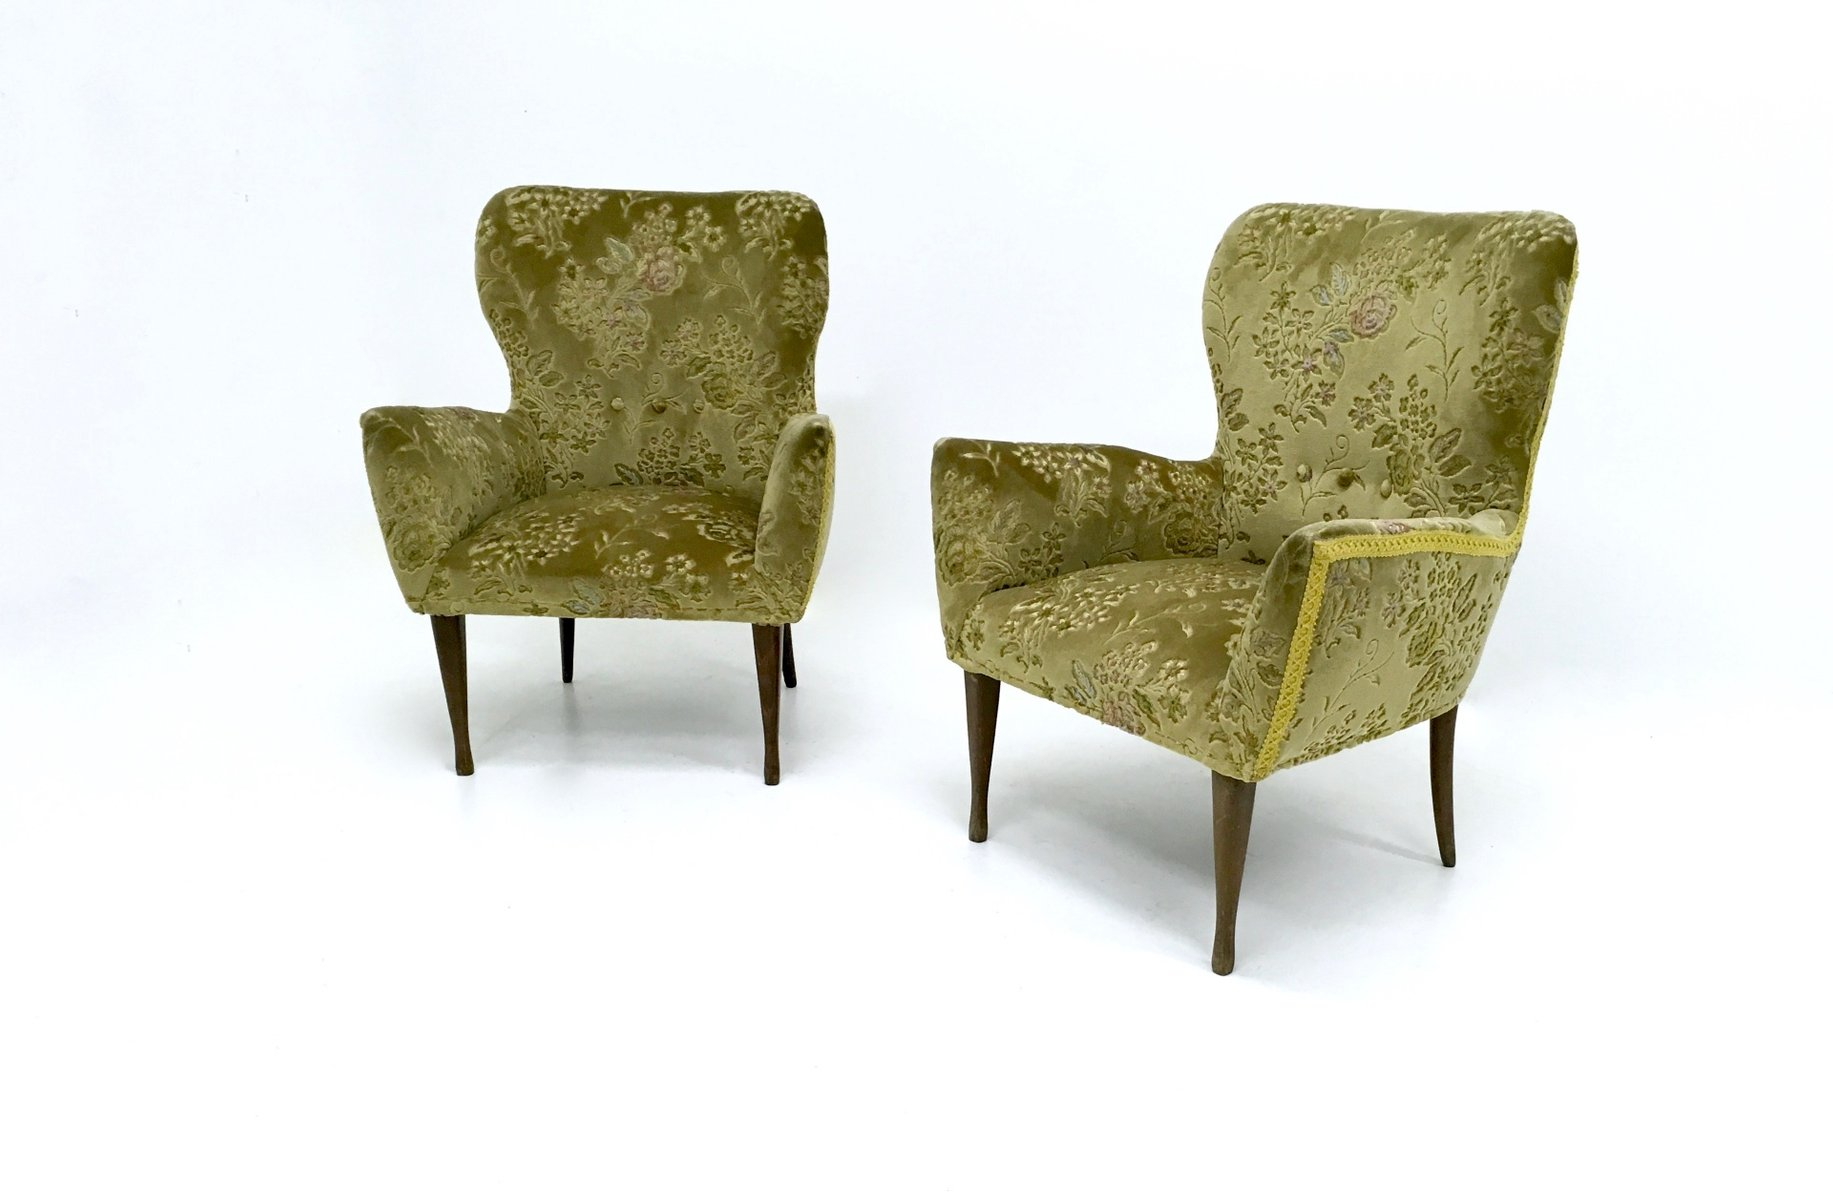 italienische gr ne vintage sessel aus samt 1950er 2er set bei pamono kaufen. Black Bedroom Furniture Sets. Home Design Ideas